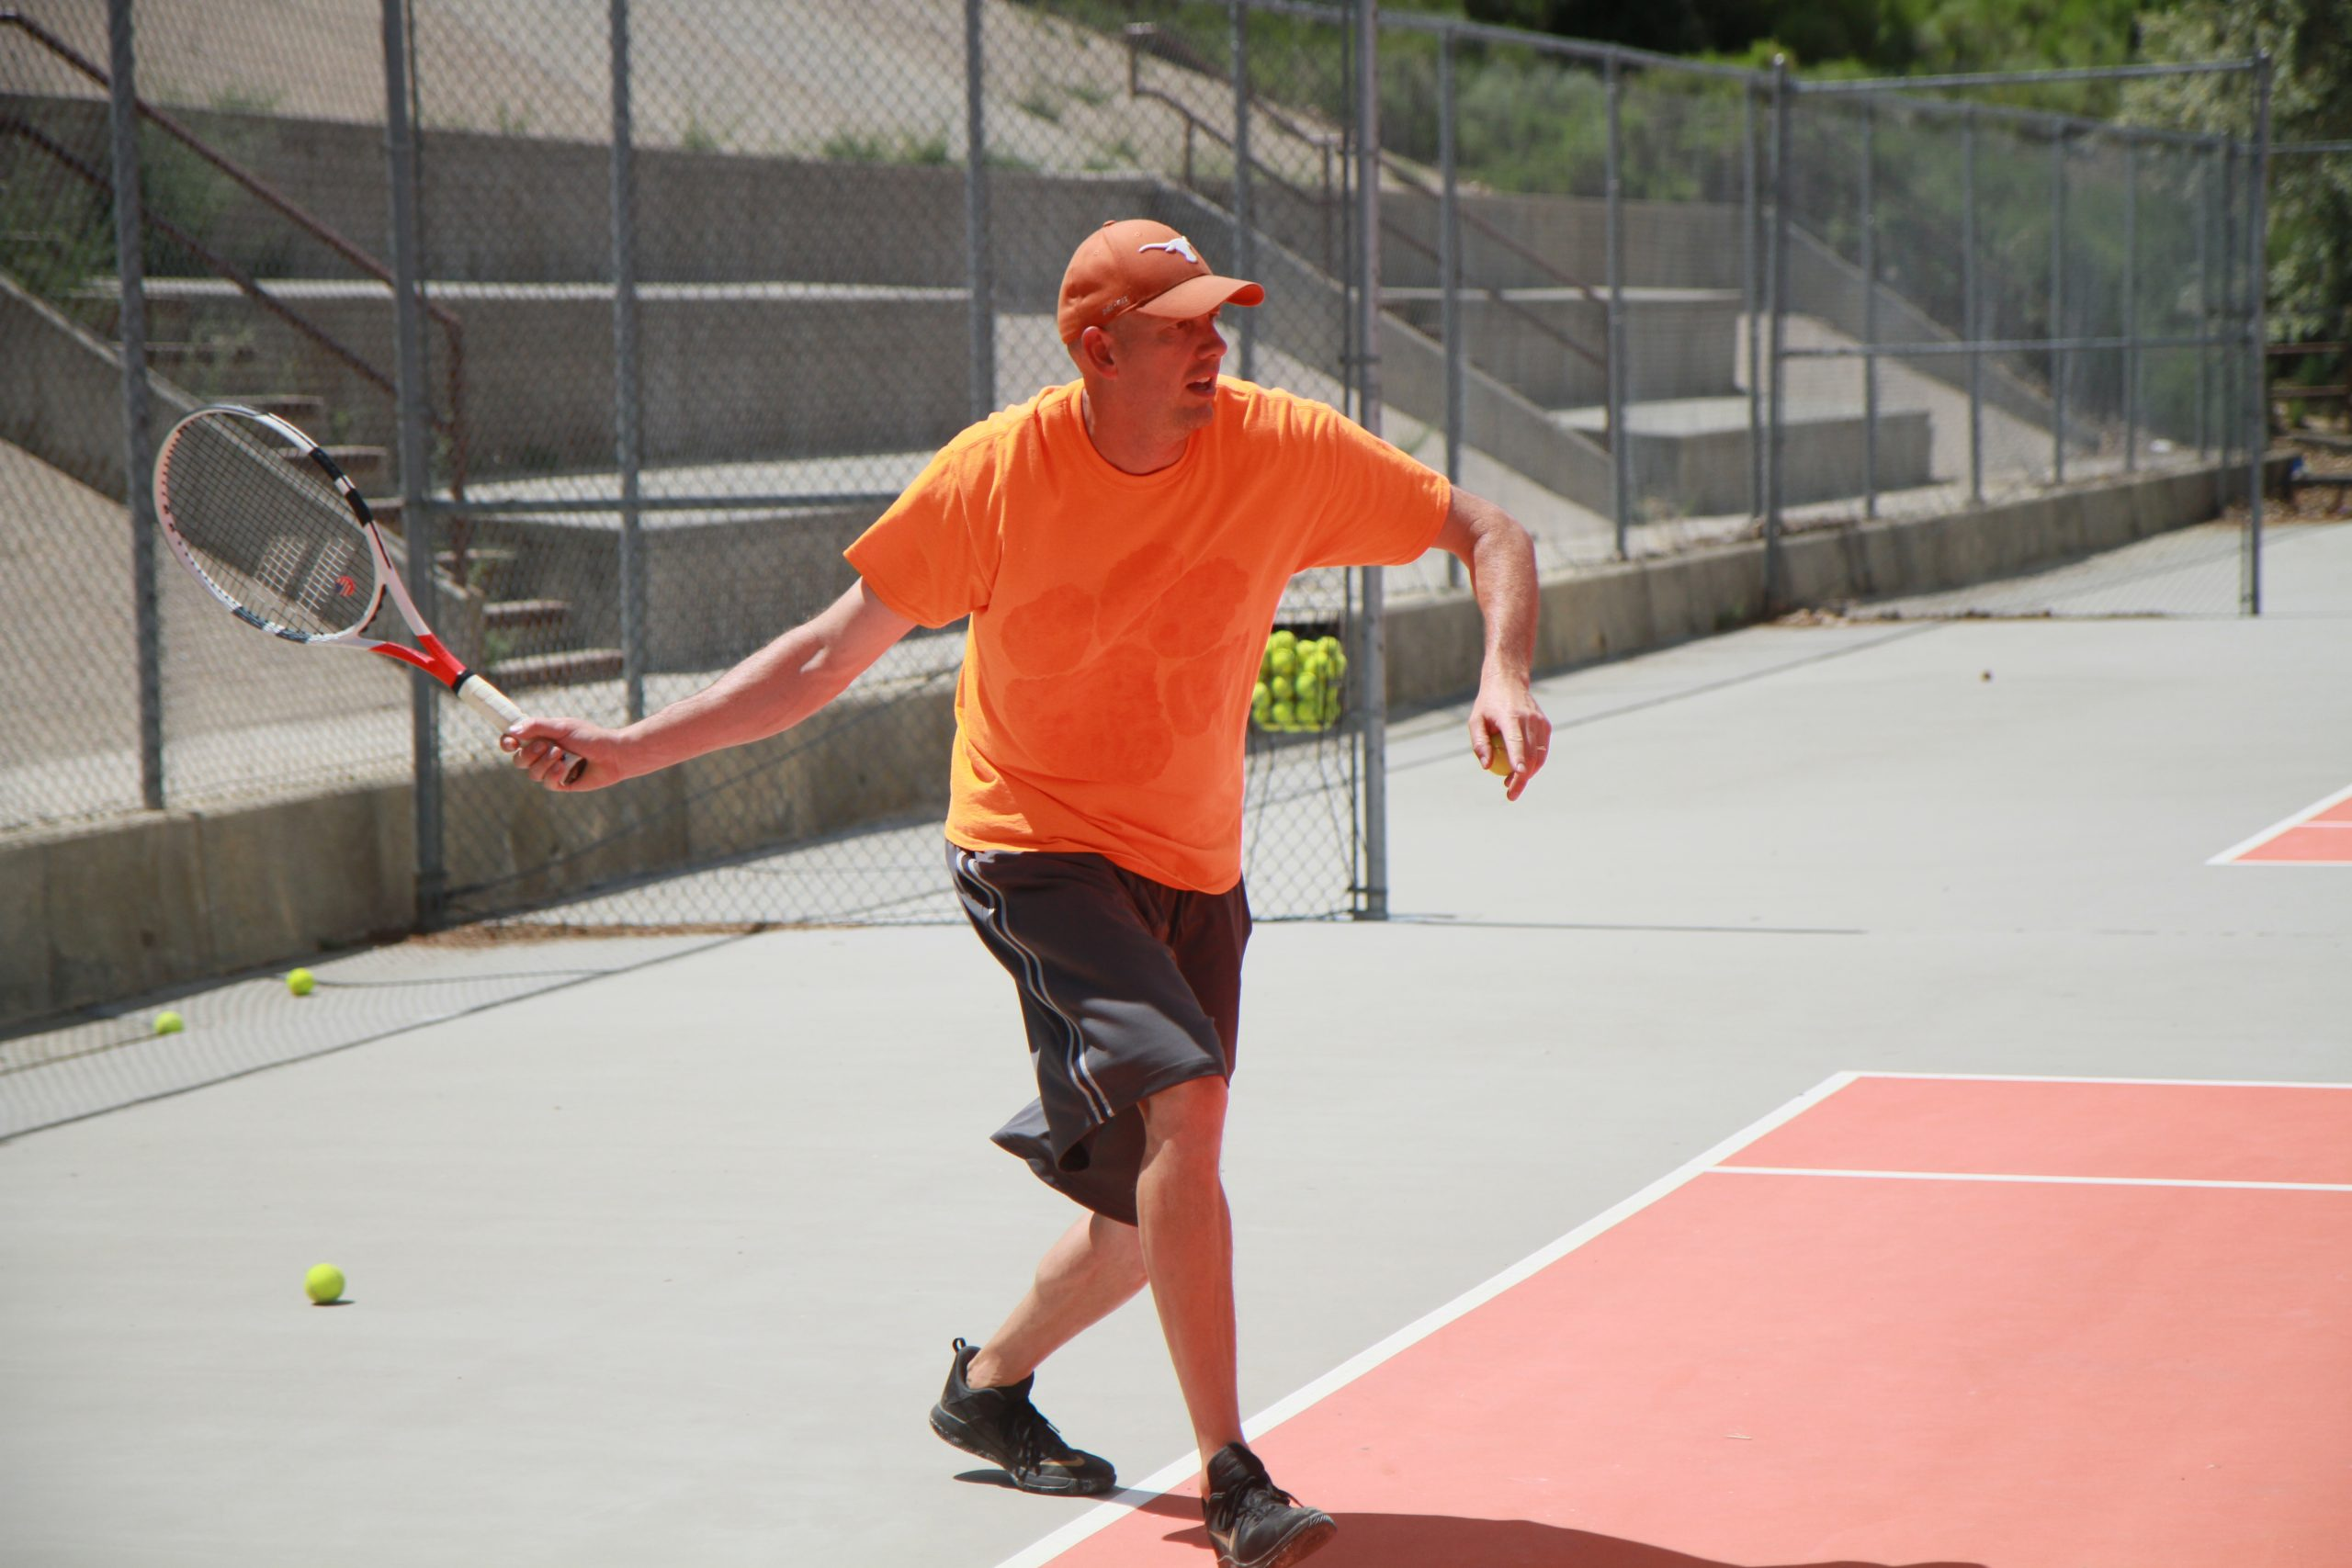 Local Tennis Coach Selected to Coach USTA BG12 Team